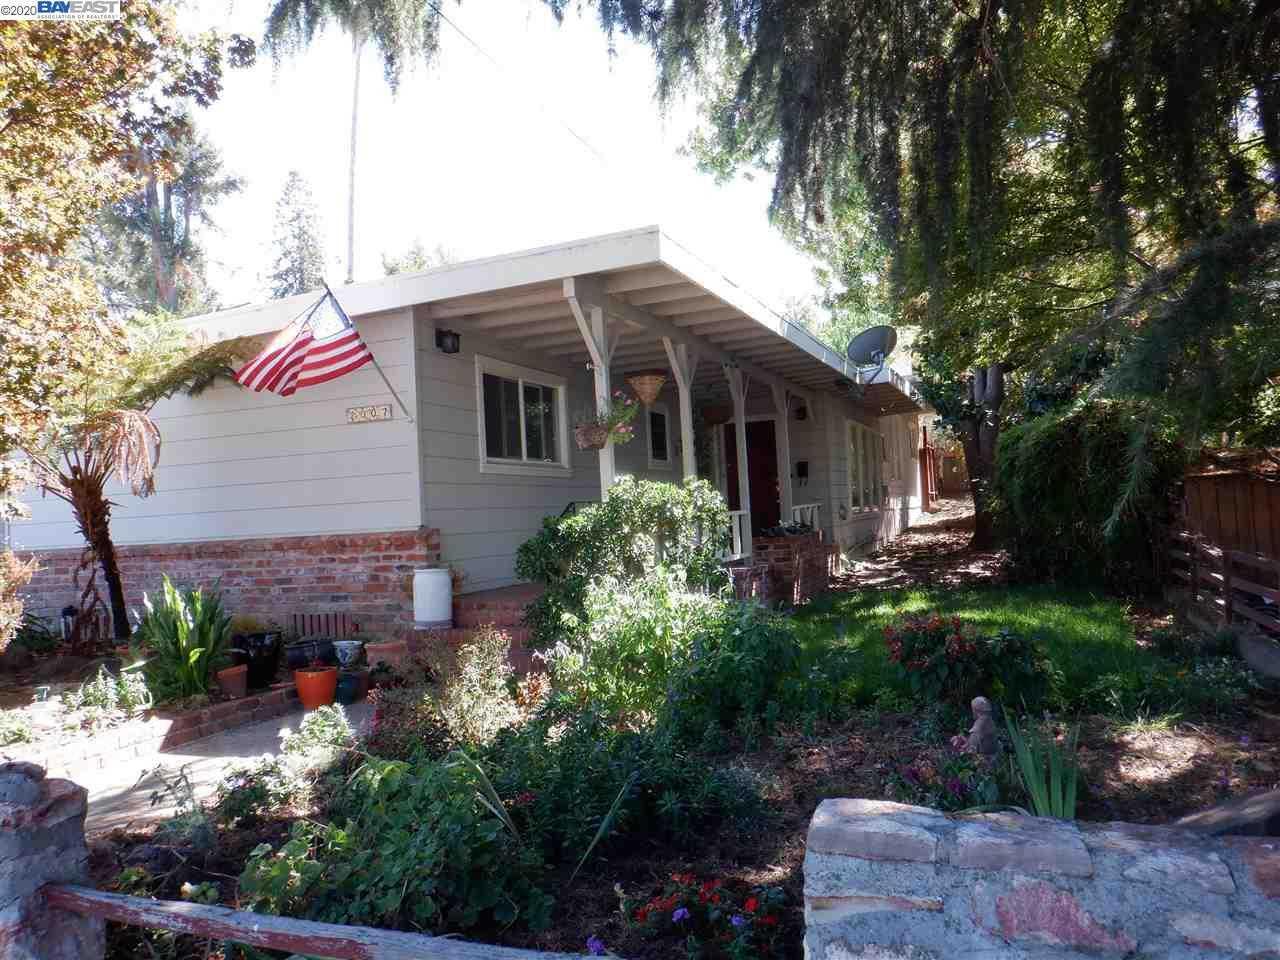 $875,950 - 4Br/2Ba -  for Sale in Fairview, Hayward